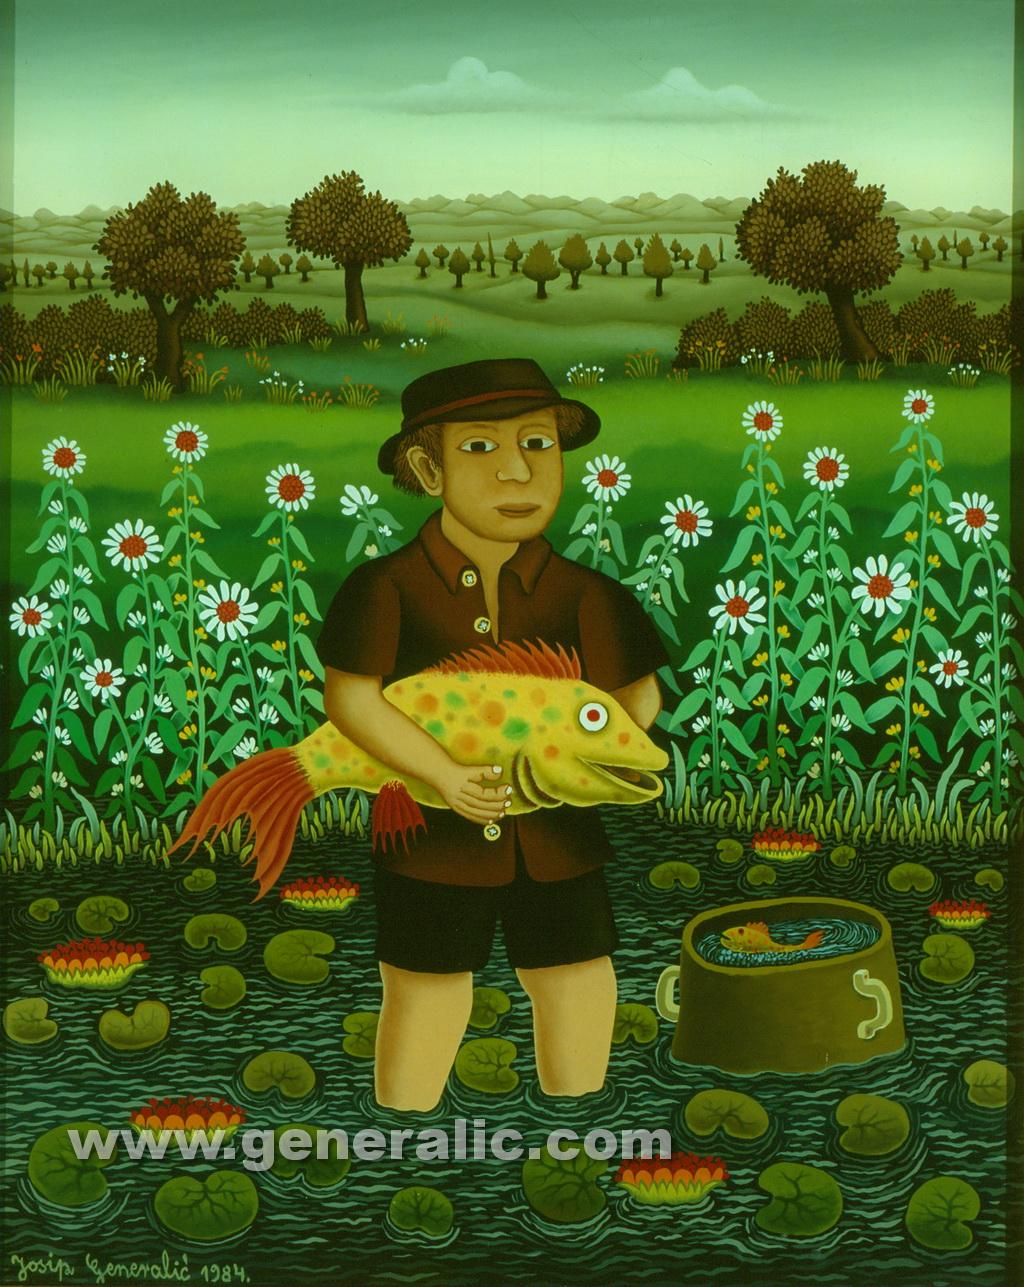 Josip Generalic, 1984, Fisherman with yellow fish, oil on glass